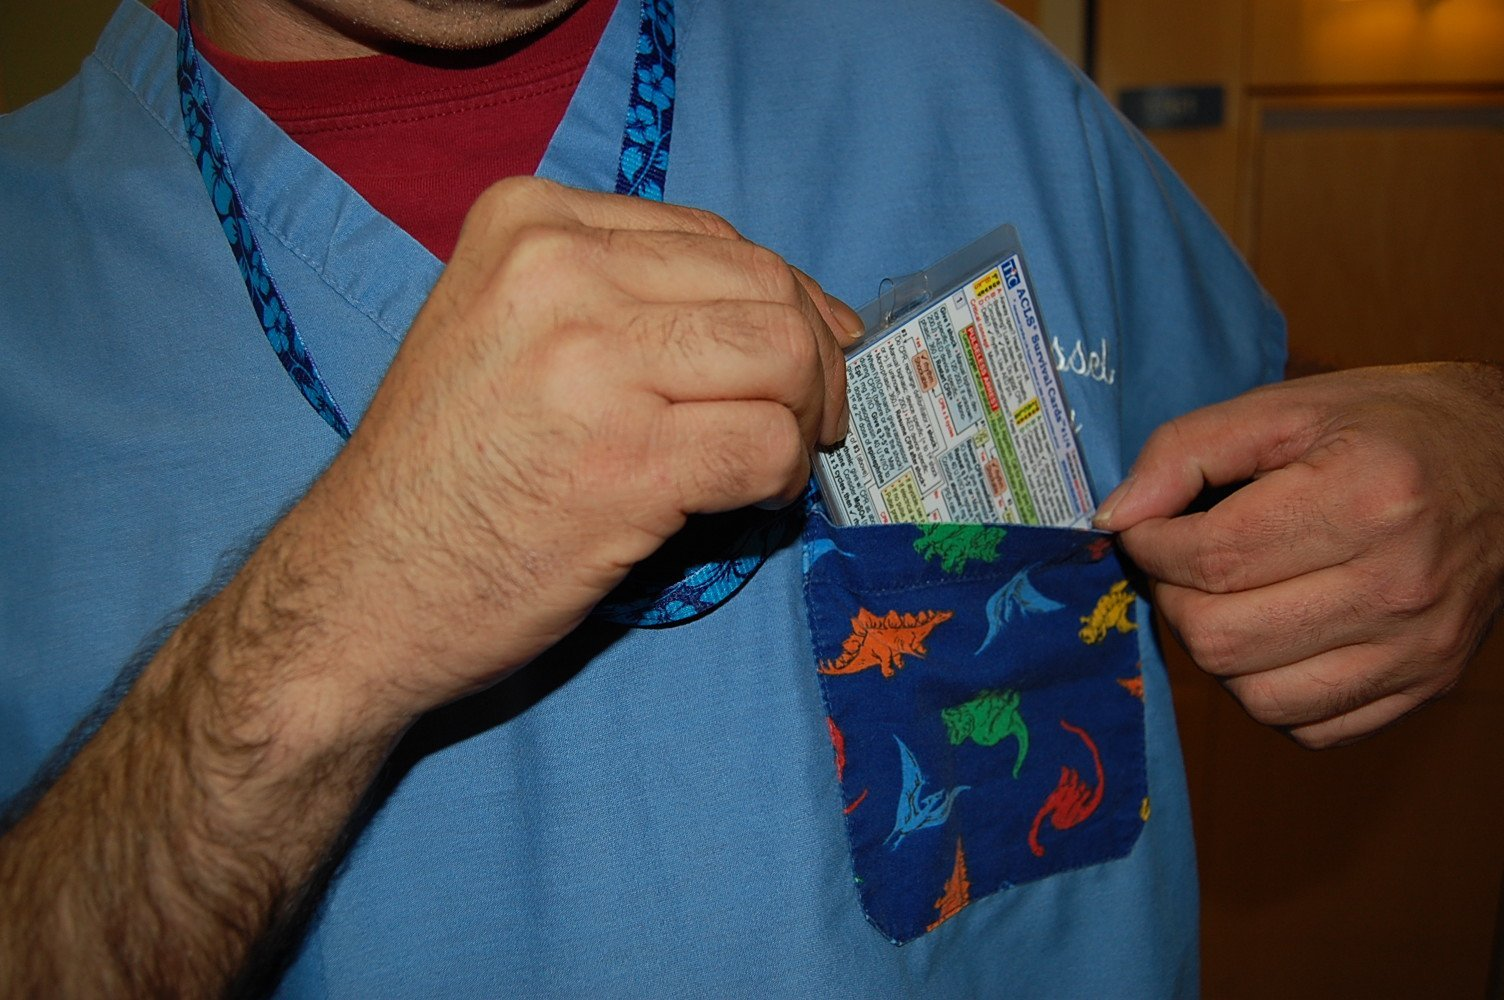 ultimate nicu survival card neonatal intensive care unit small